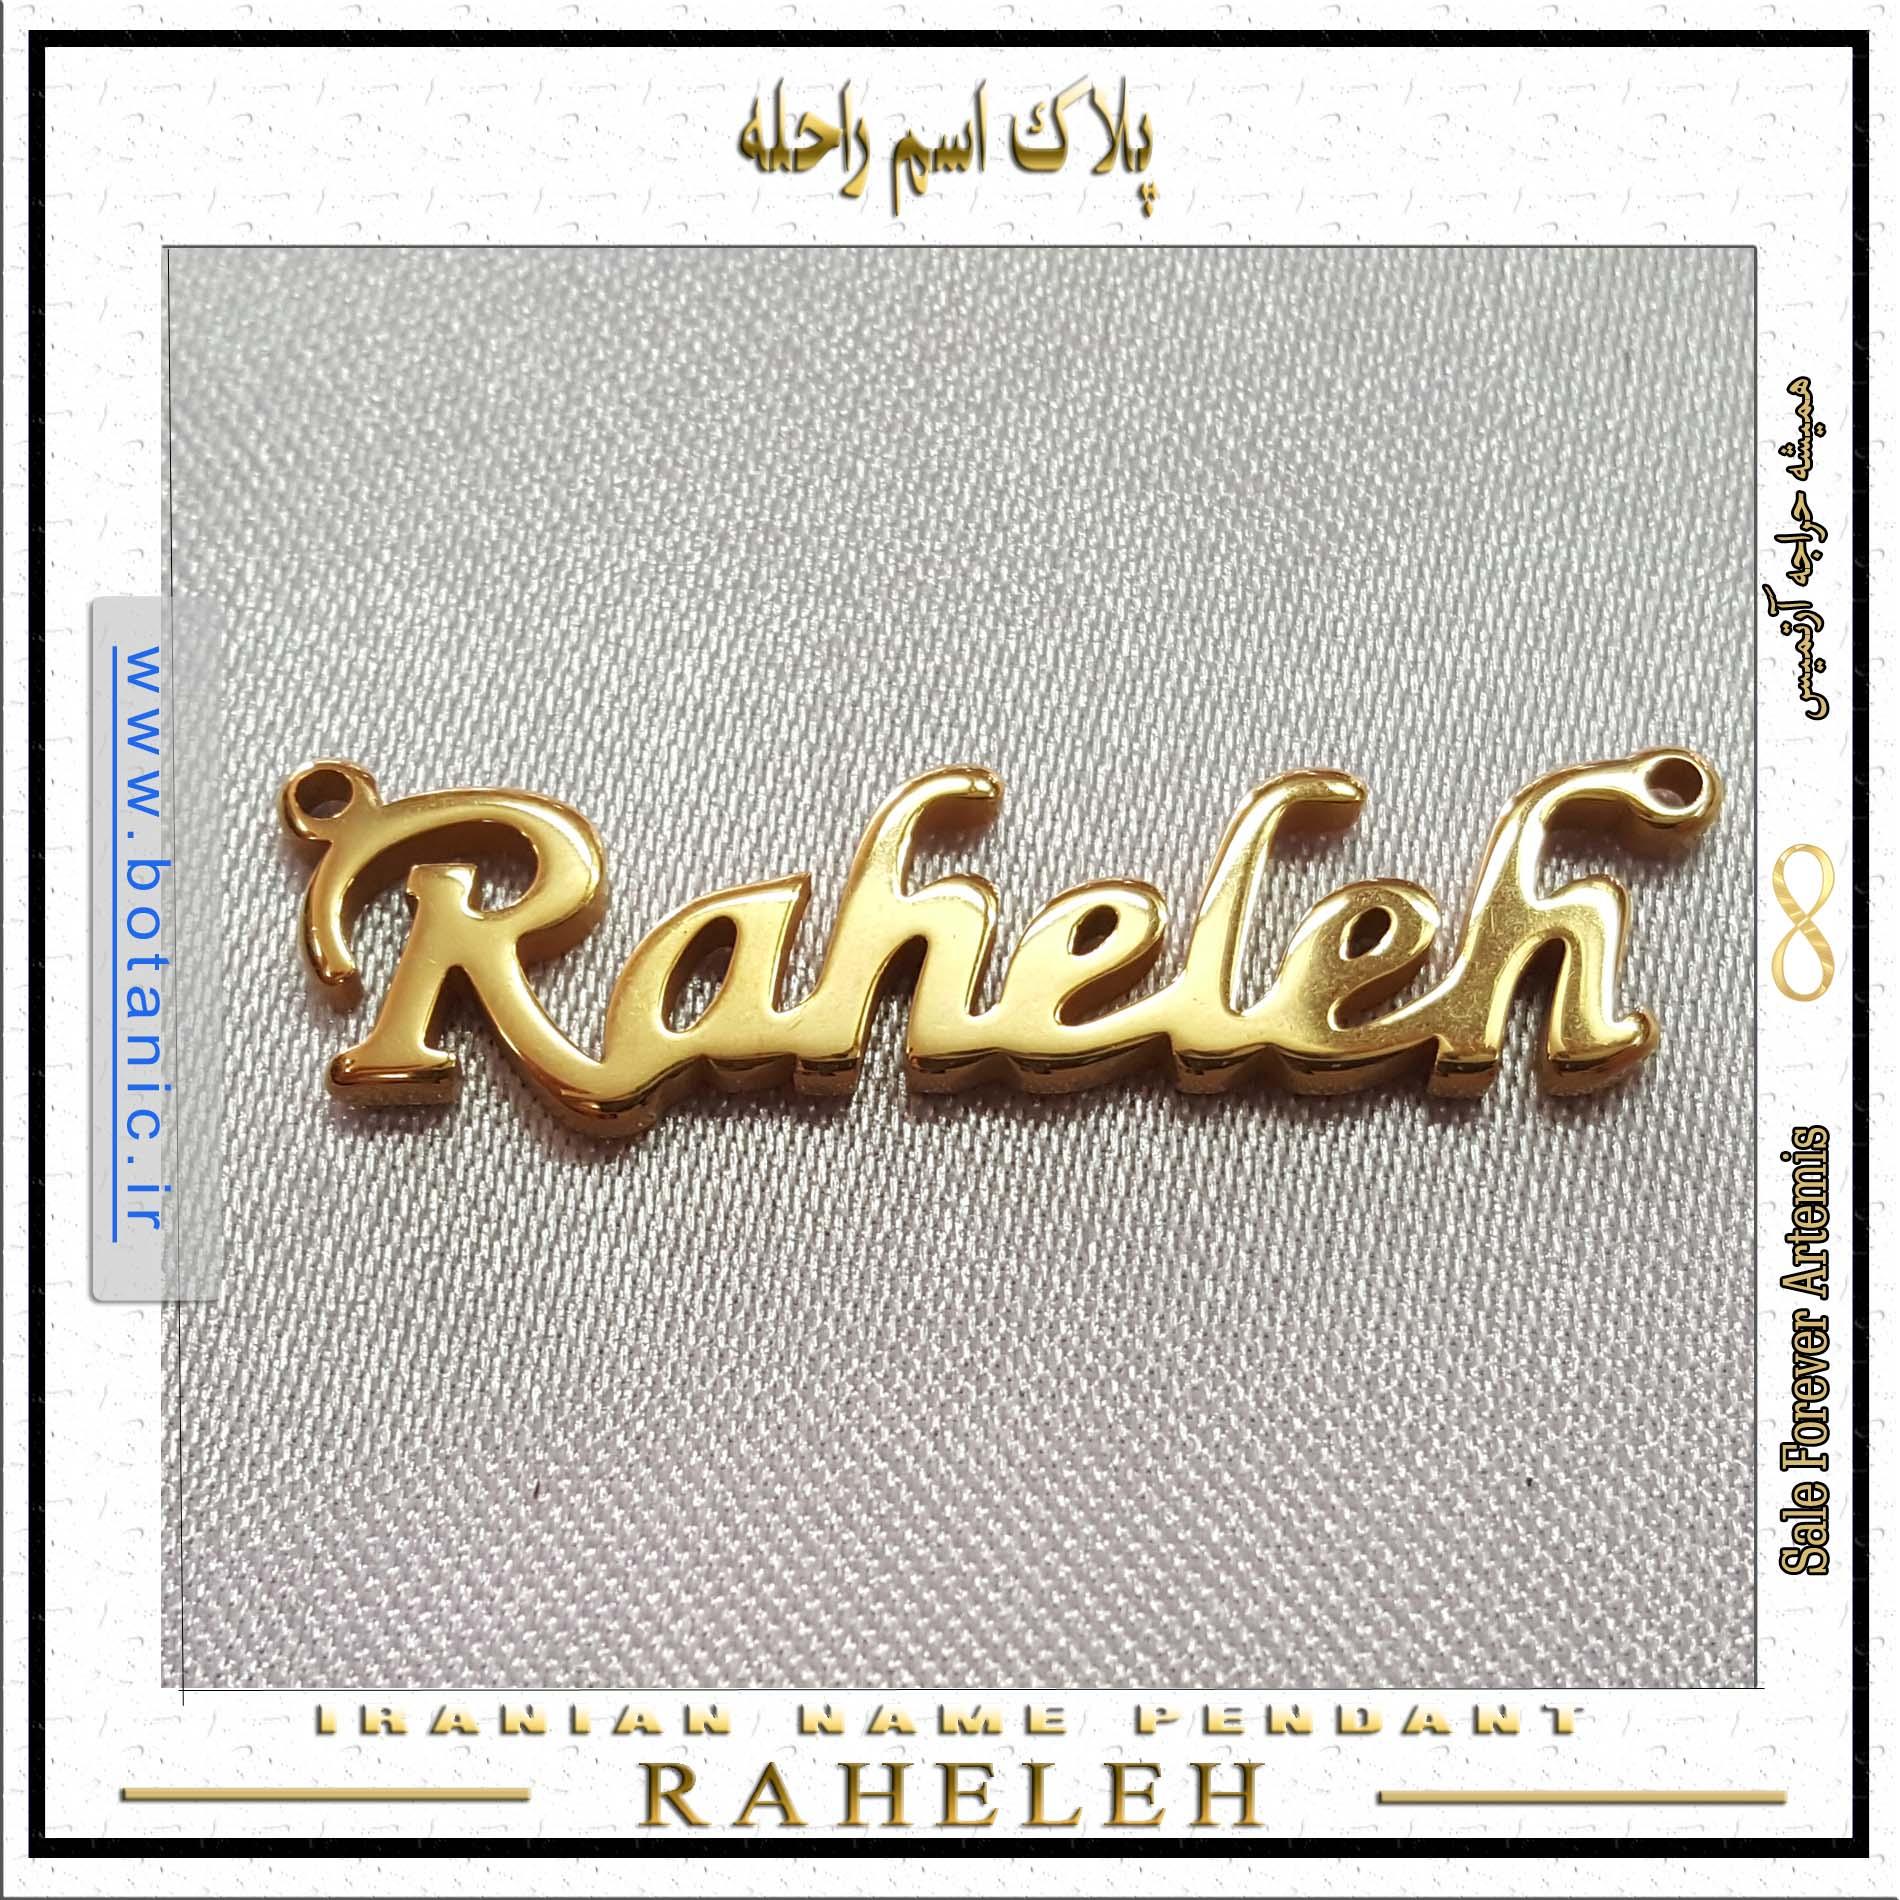 Iranian Name Pendant Raheleh